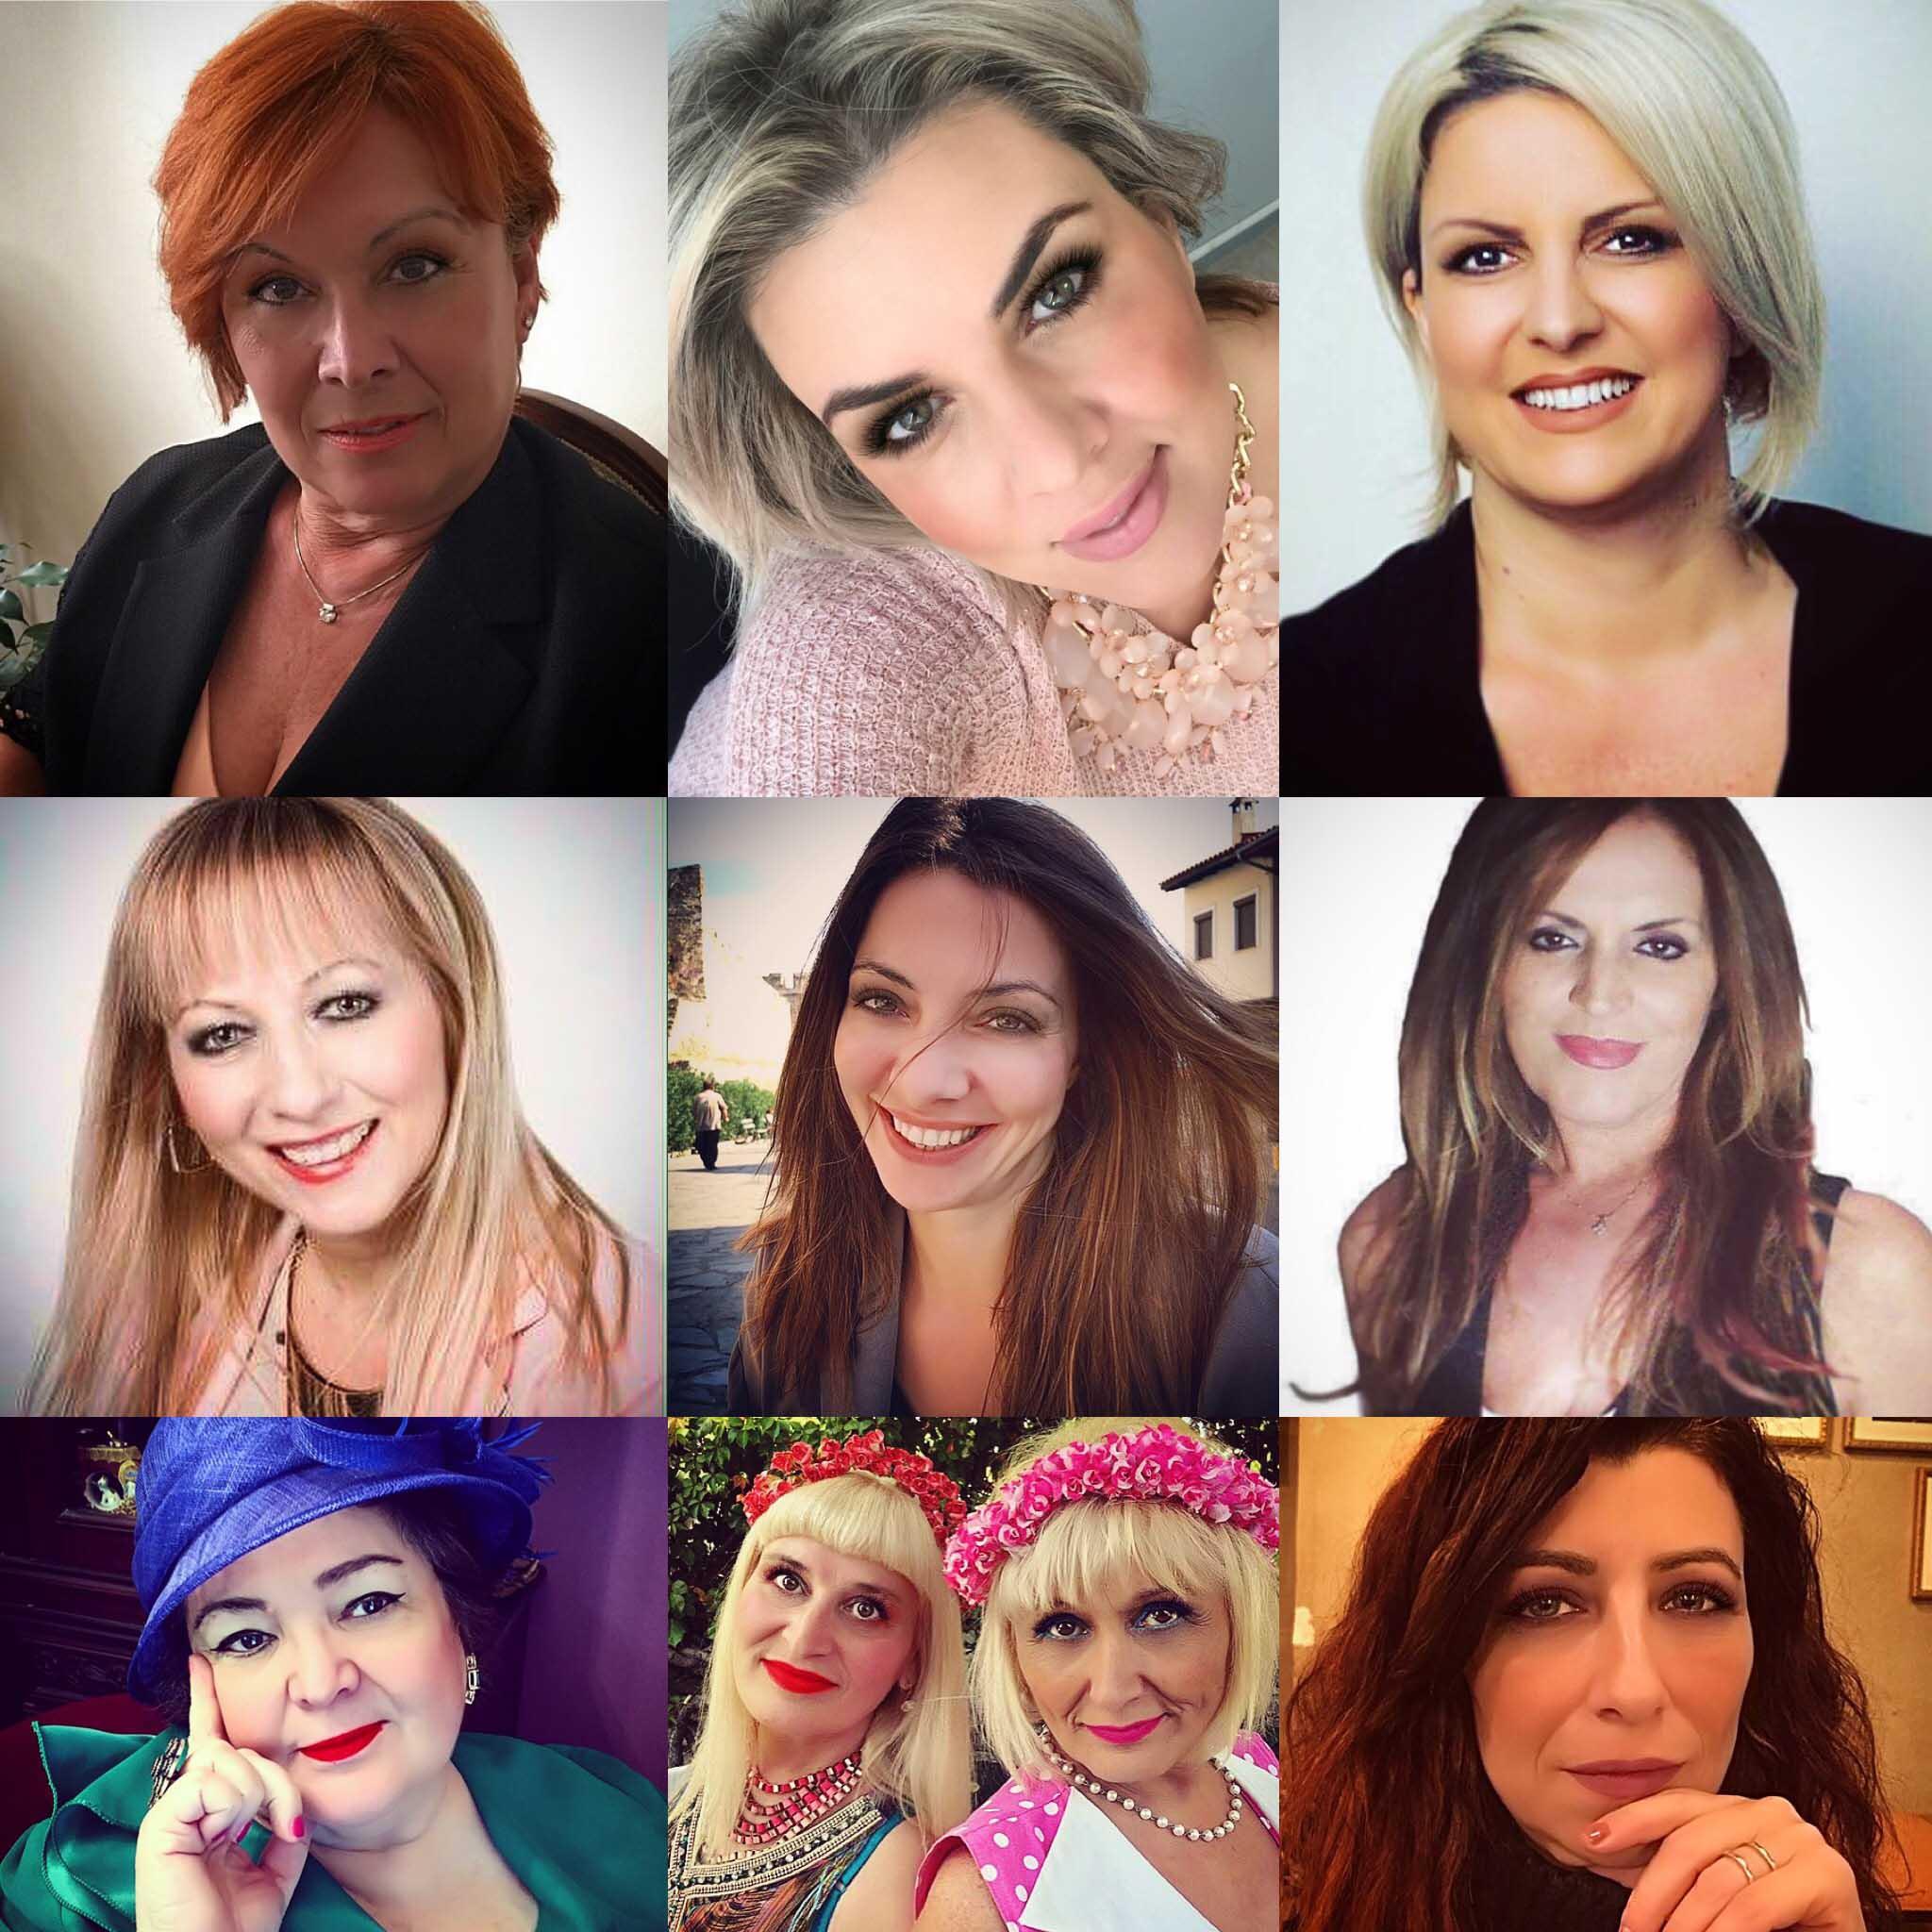 Womens power instagram portraits-Γυναίκες μαζί